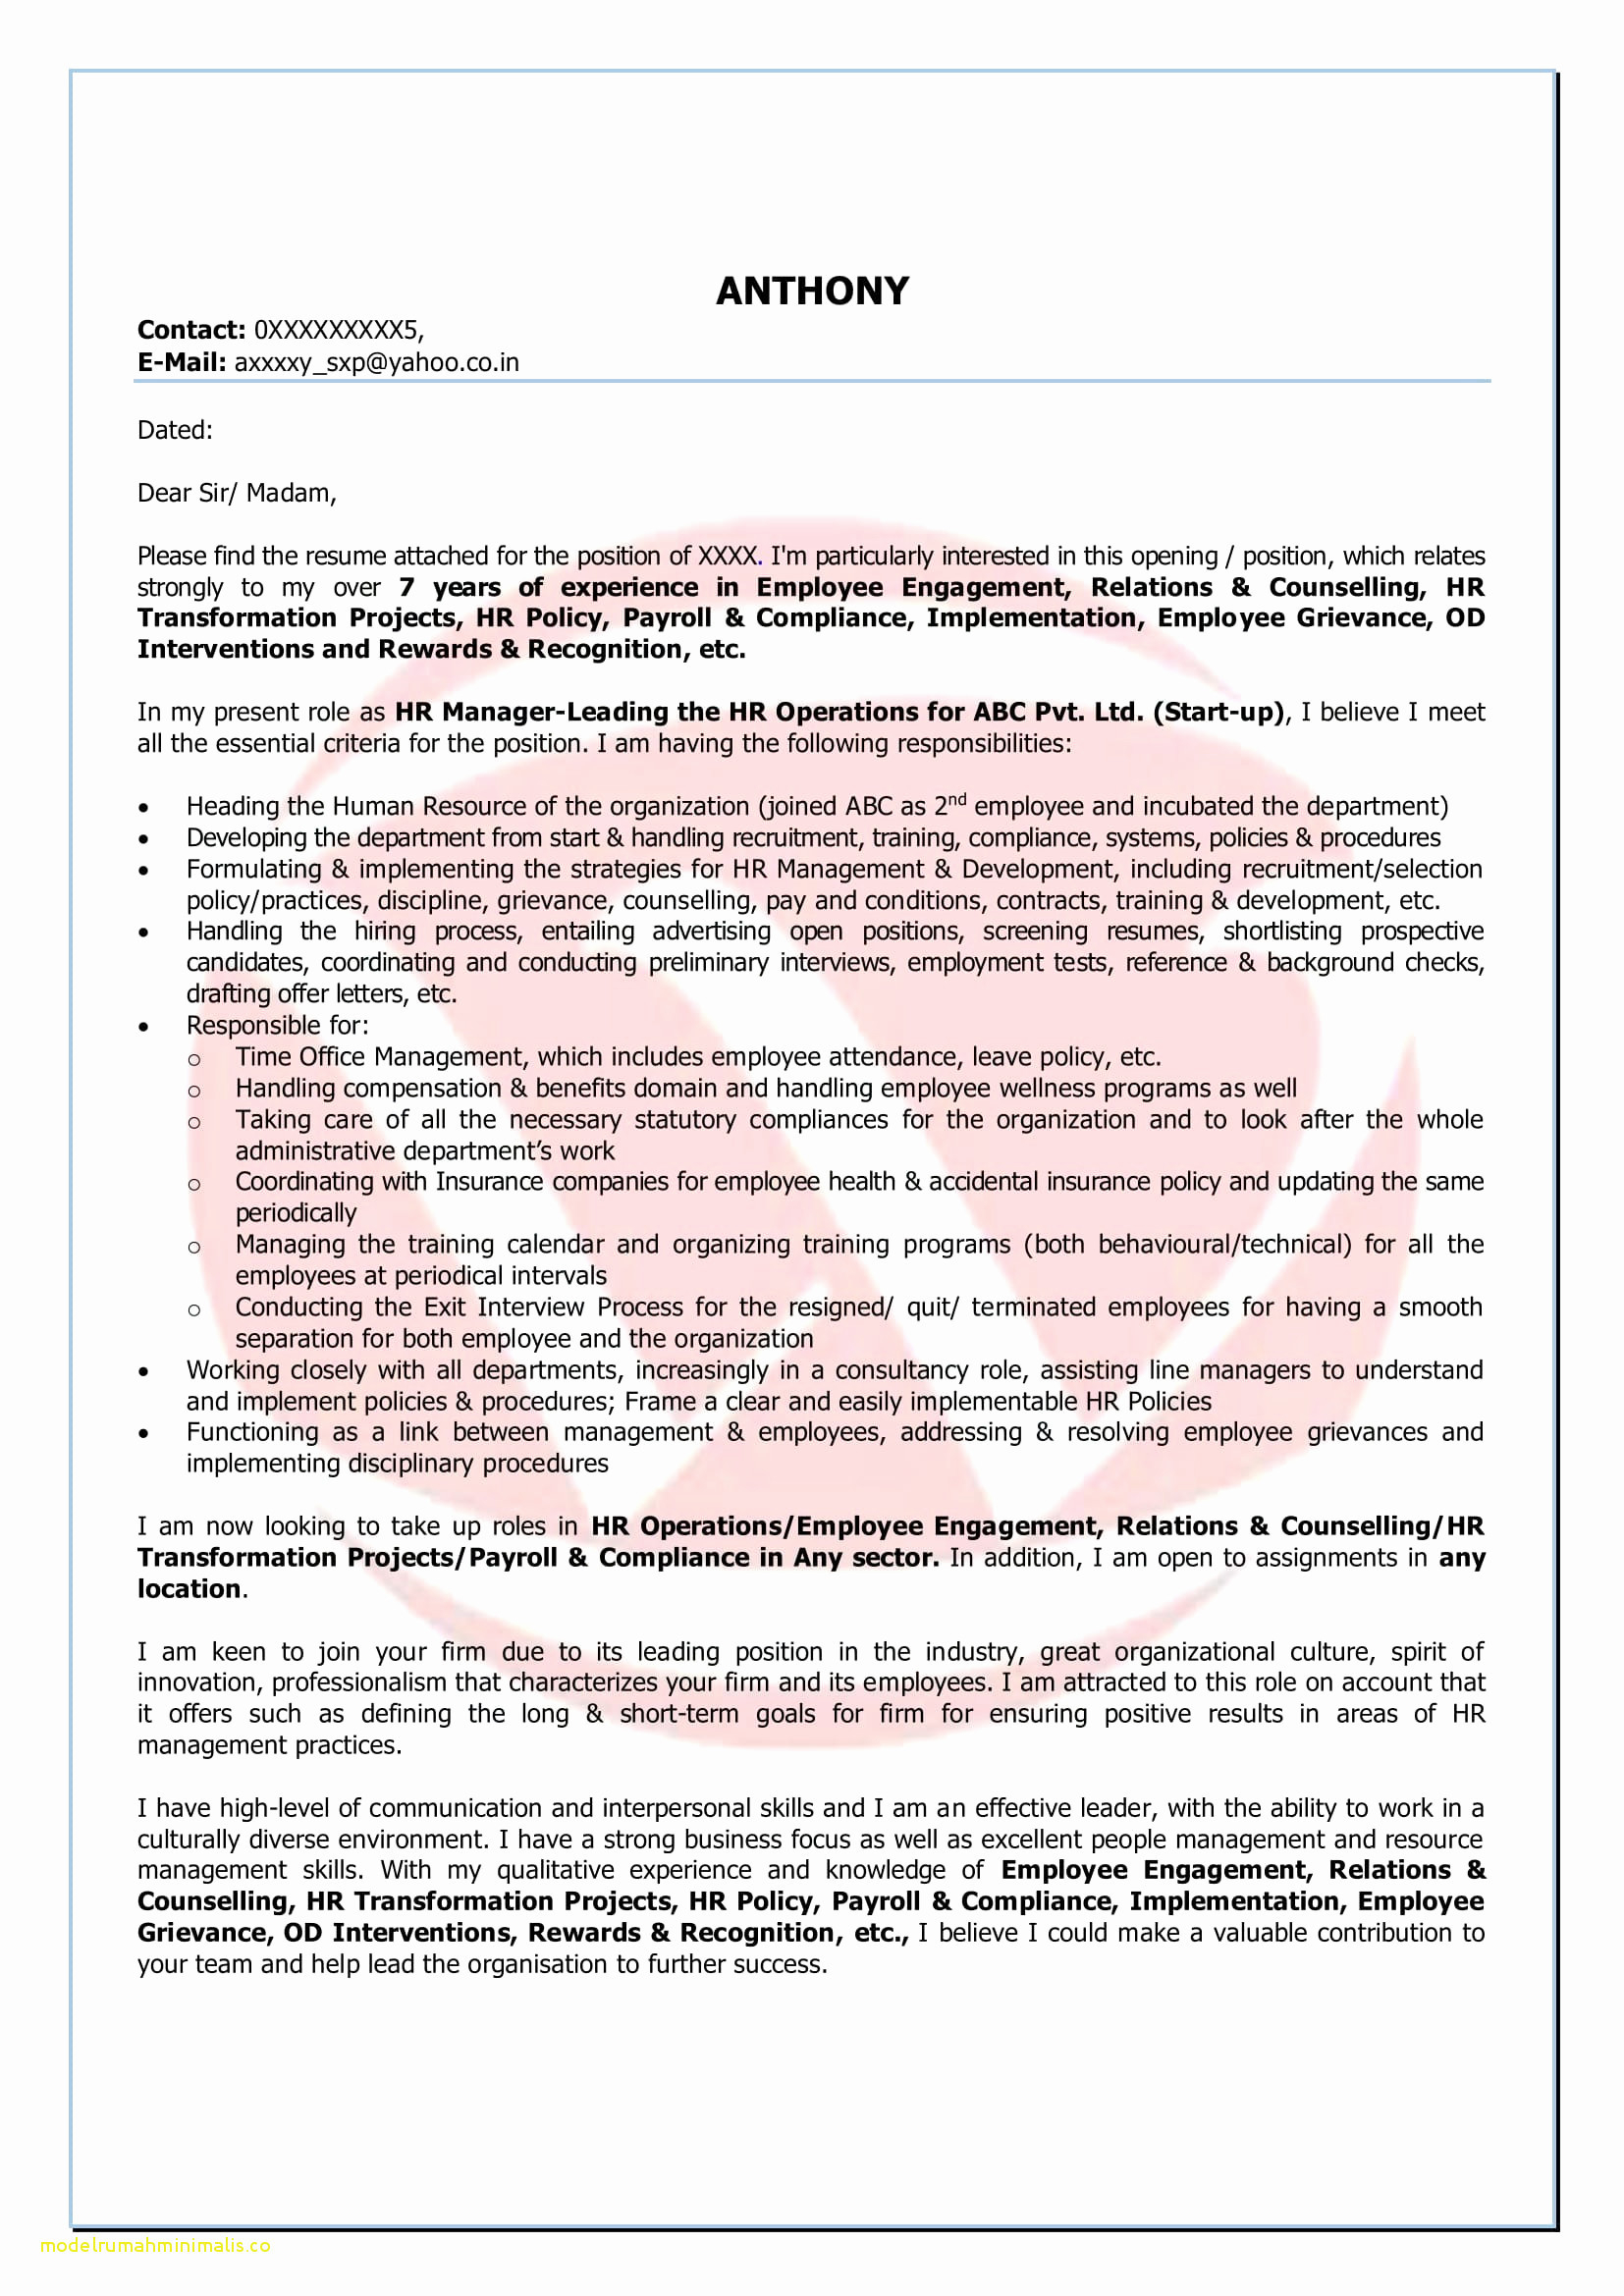 Mortgage Default Letter Template - Hardship Letter for Mortgage Luxury 31 Lovely Job Letter for